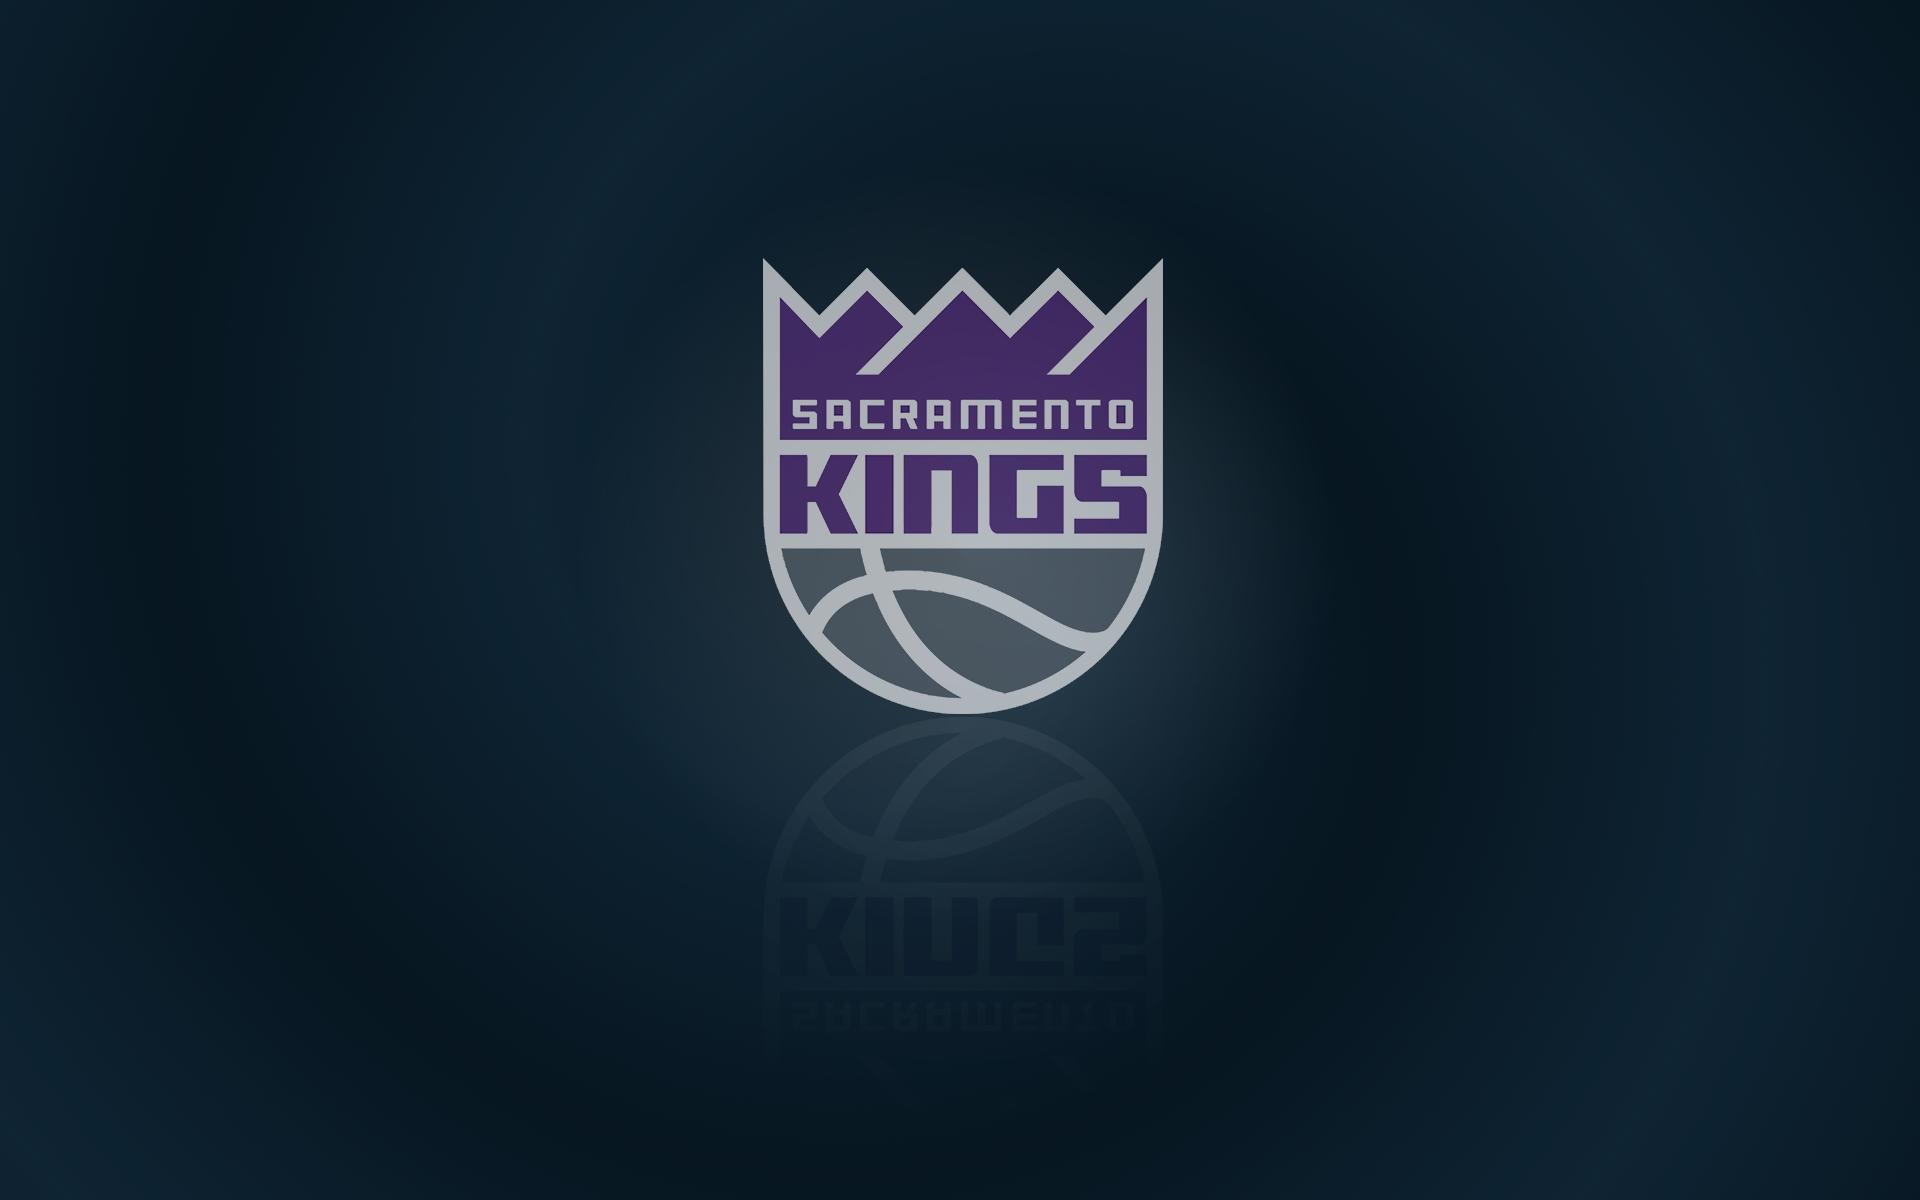 Sacramento Kings HD Wallpaper Background Image 1920x1200 ID 1920x1200